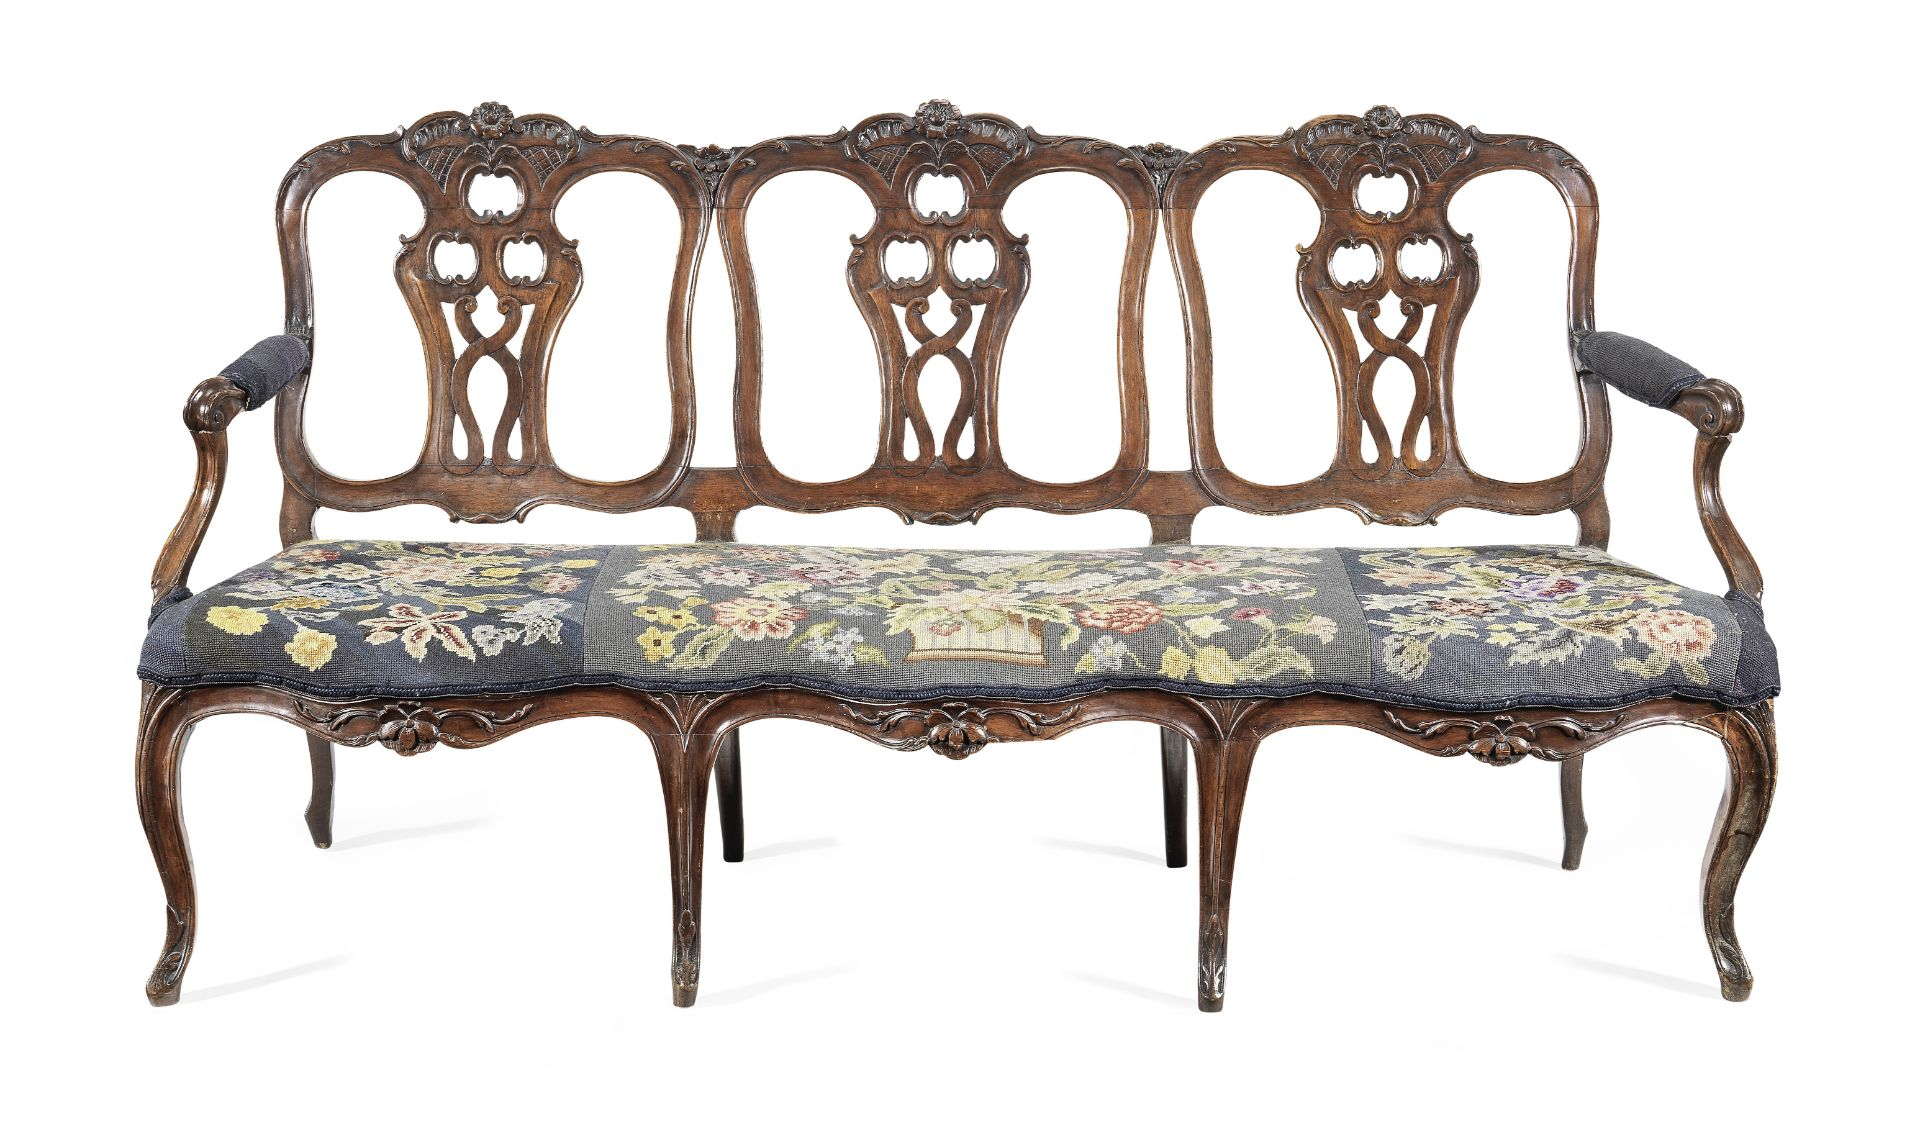 Los 90 - A Portuguese 18th century walnut triple chairback settee